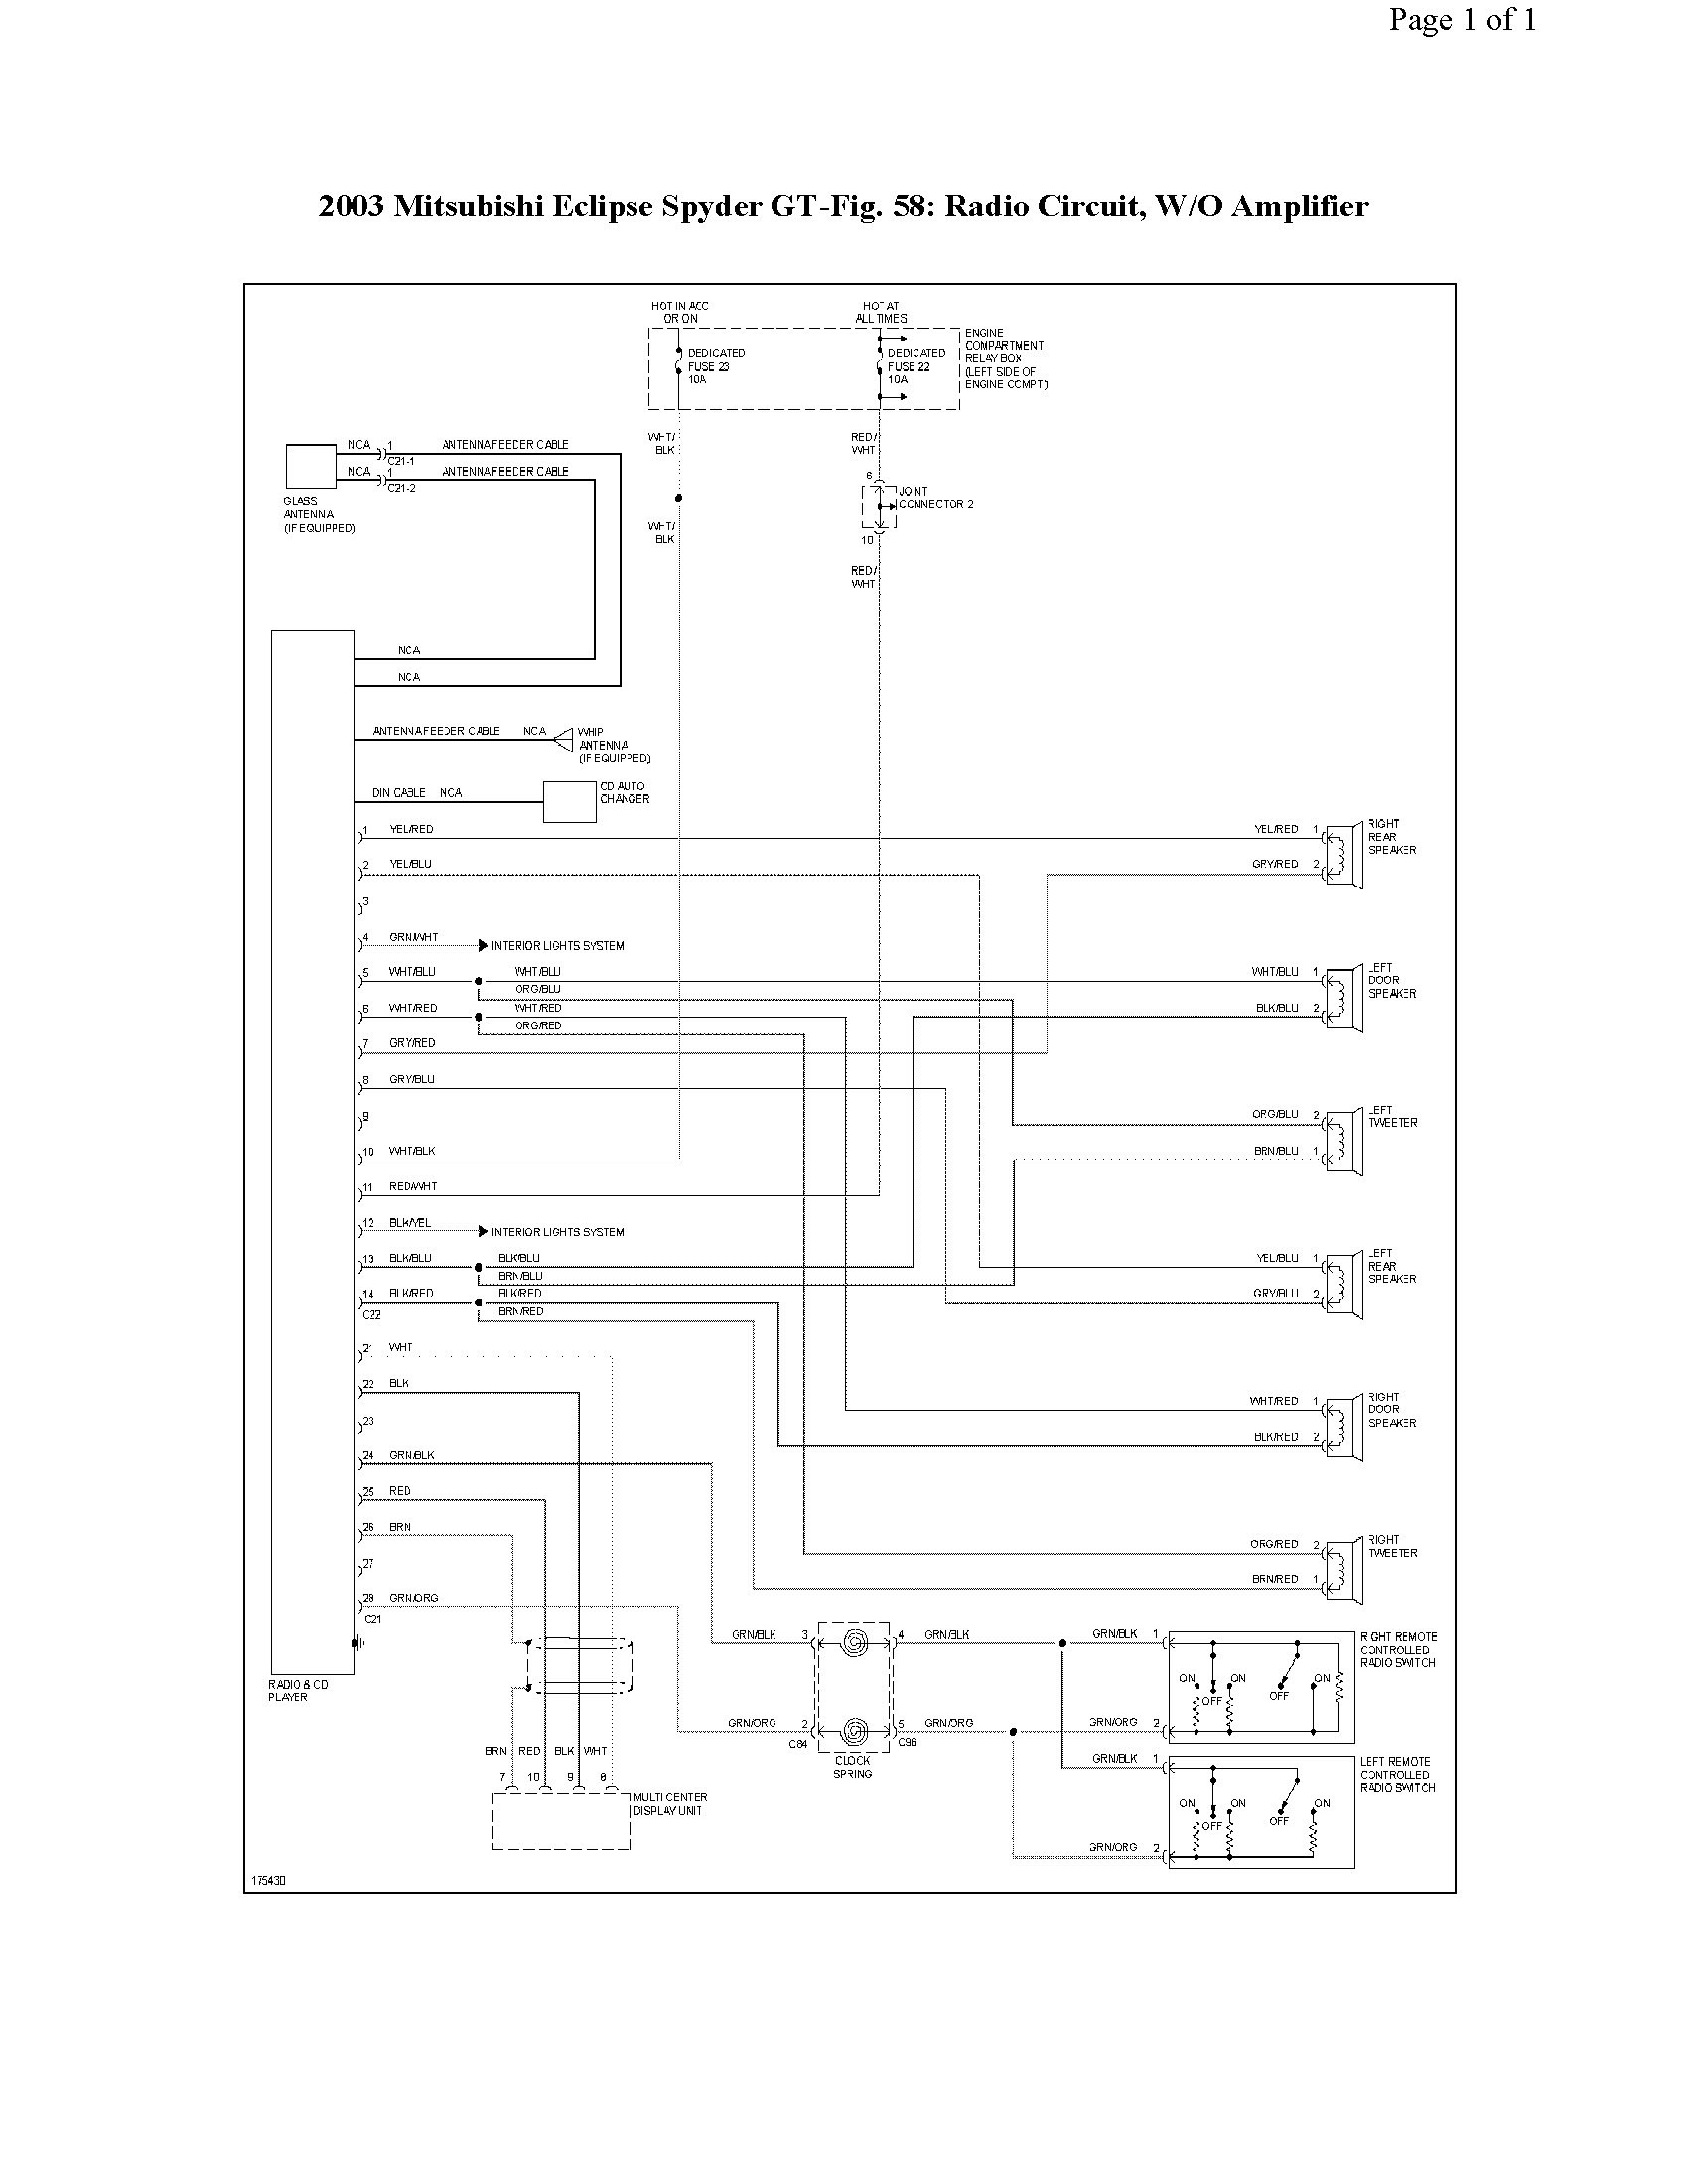 2001 Honda Civic Radio Wiring Diagram Moreover Wiring Diagram Loot Fork A Loot Fork A Valhallarestaurant It